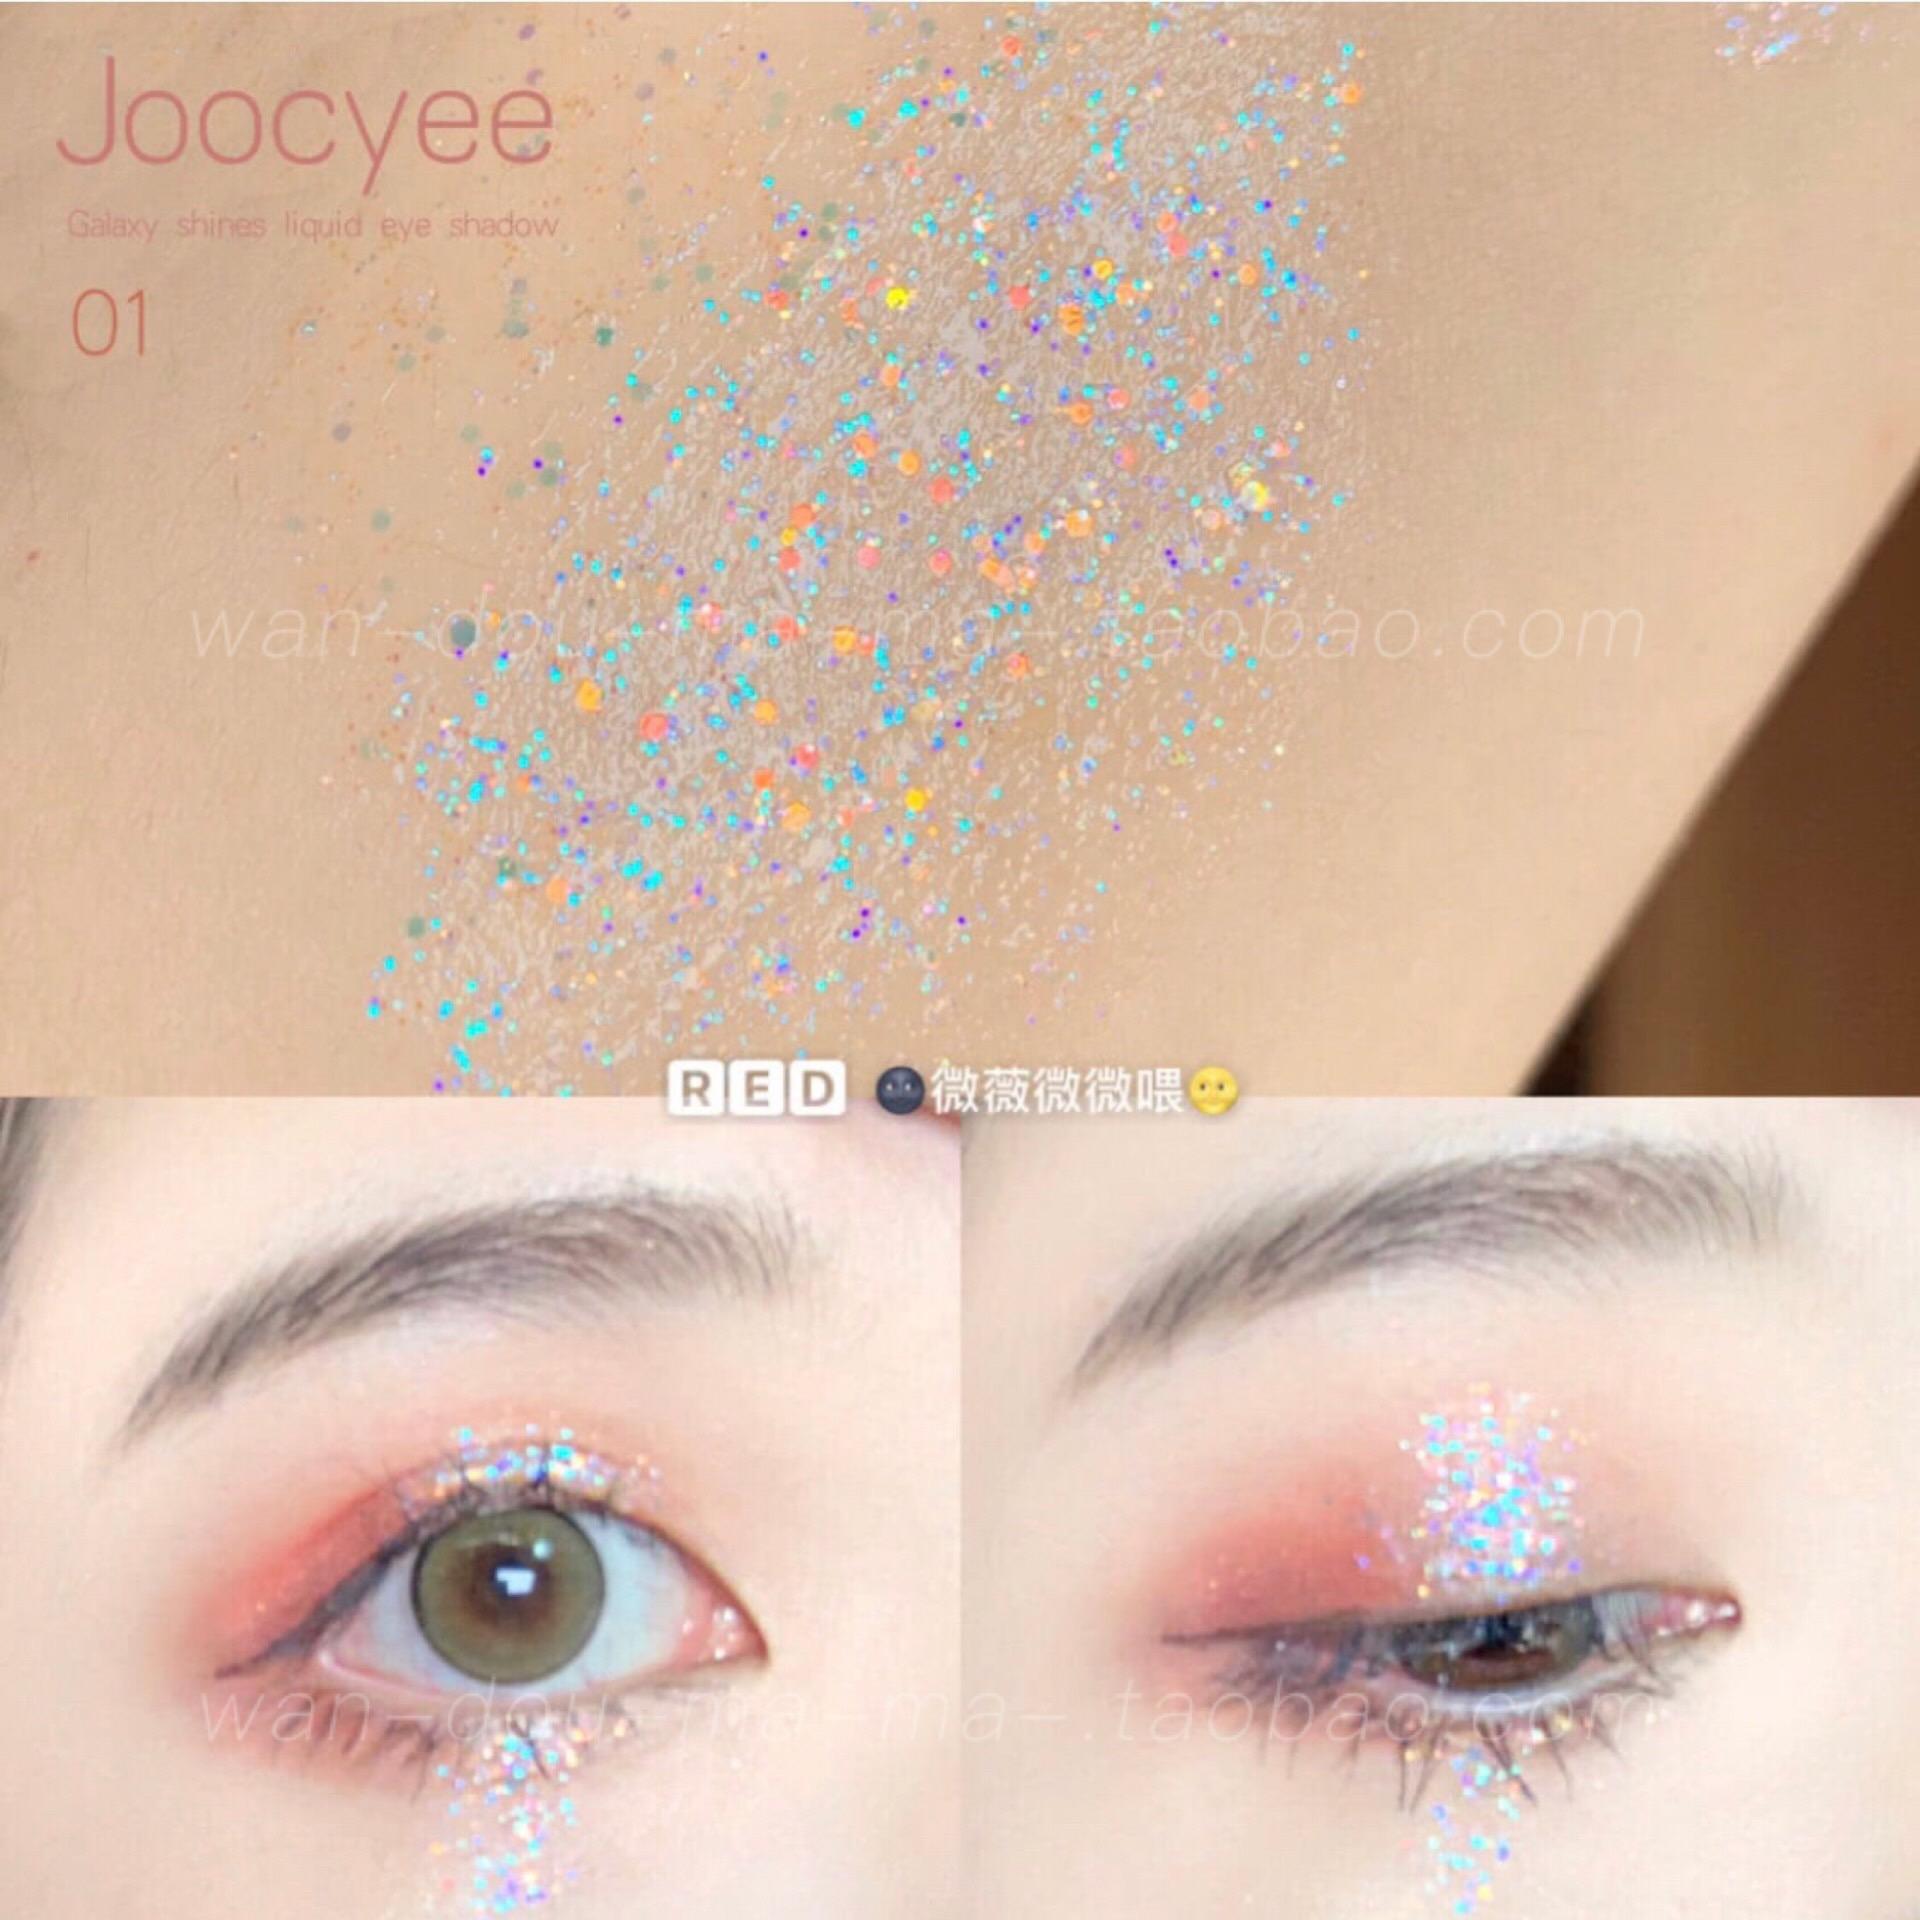 JC/Joocyee橘朵星河闪耀液体眼影珠光持久超闪亮片防水提亮初学者